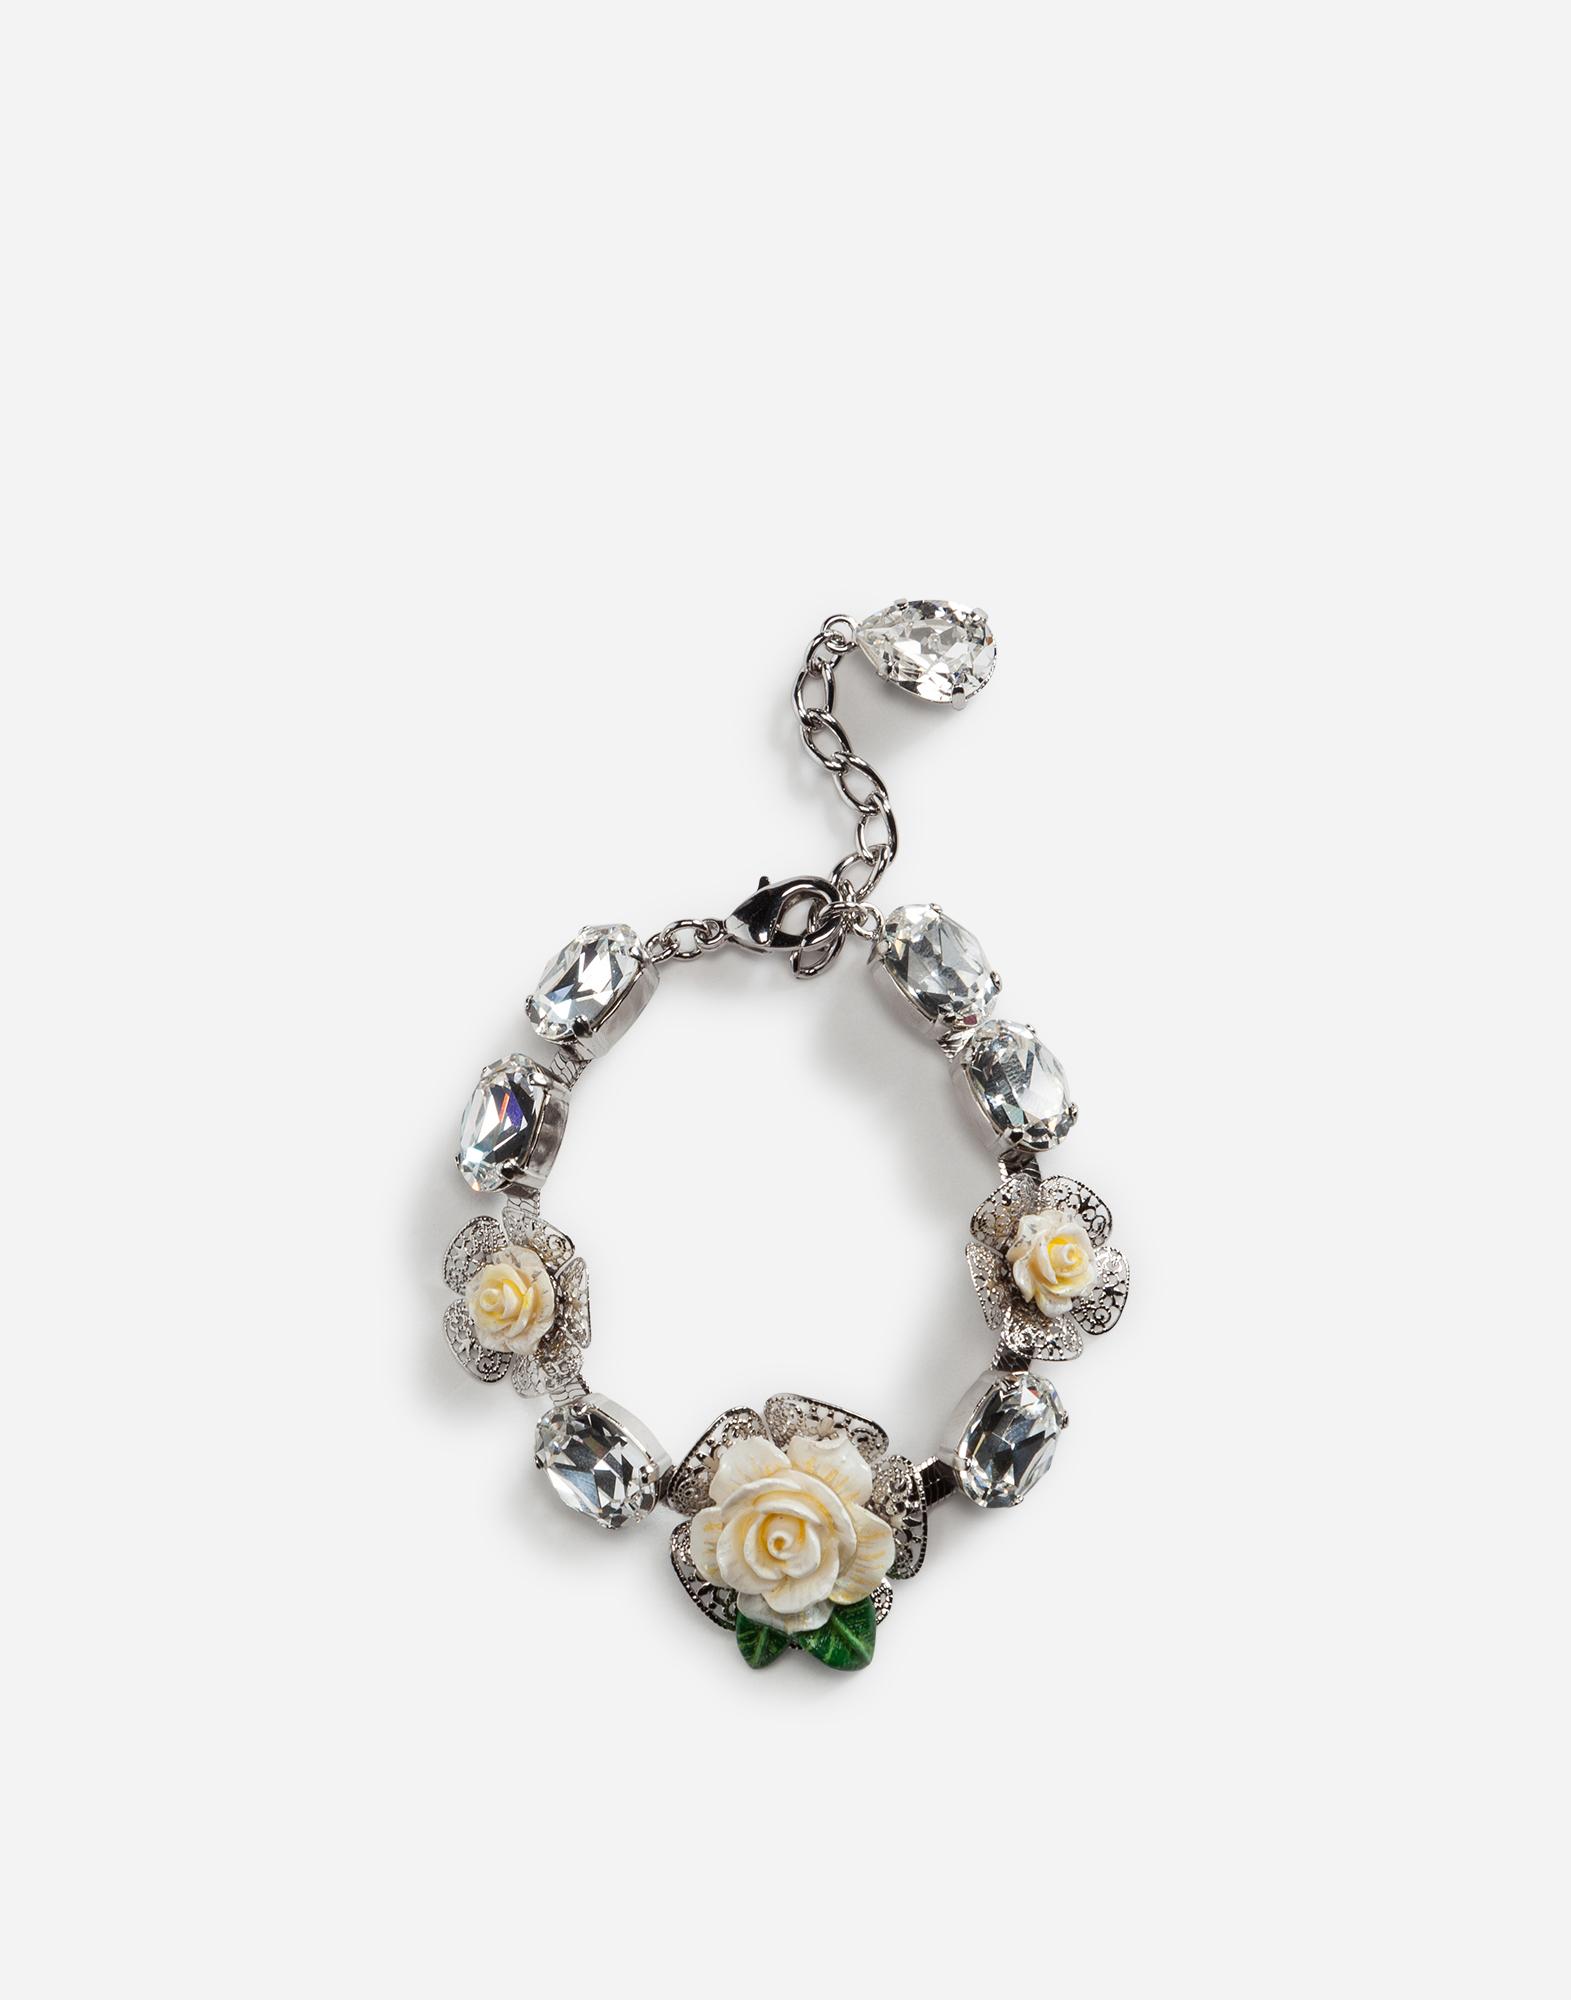 Dolce&Gabbana BRACELET WITH ROSES